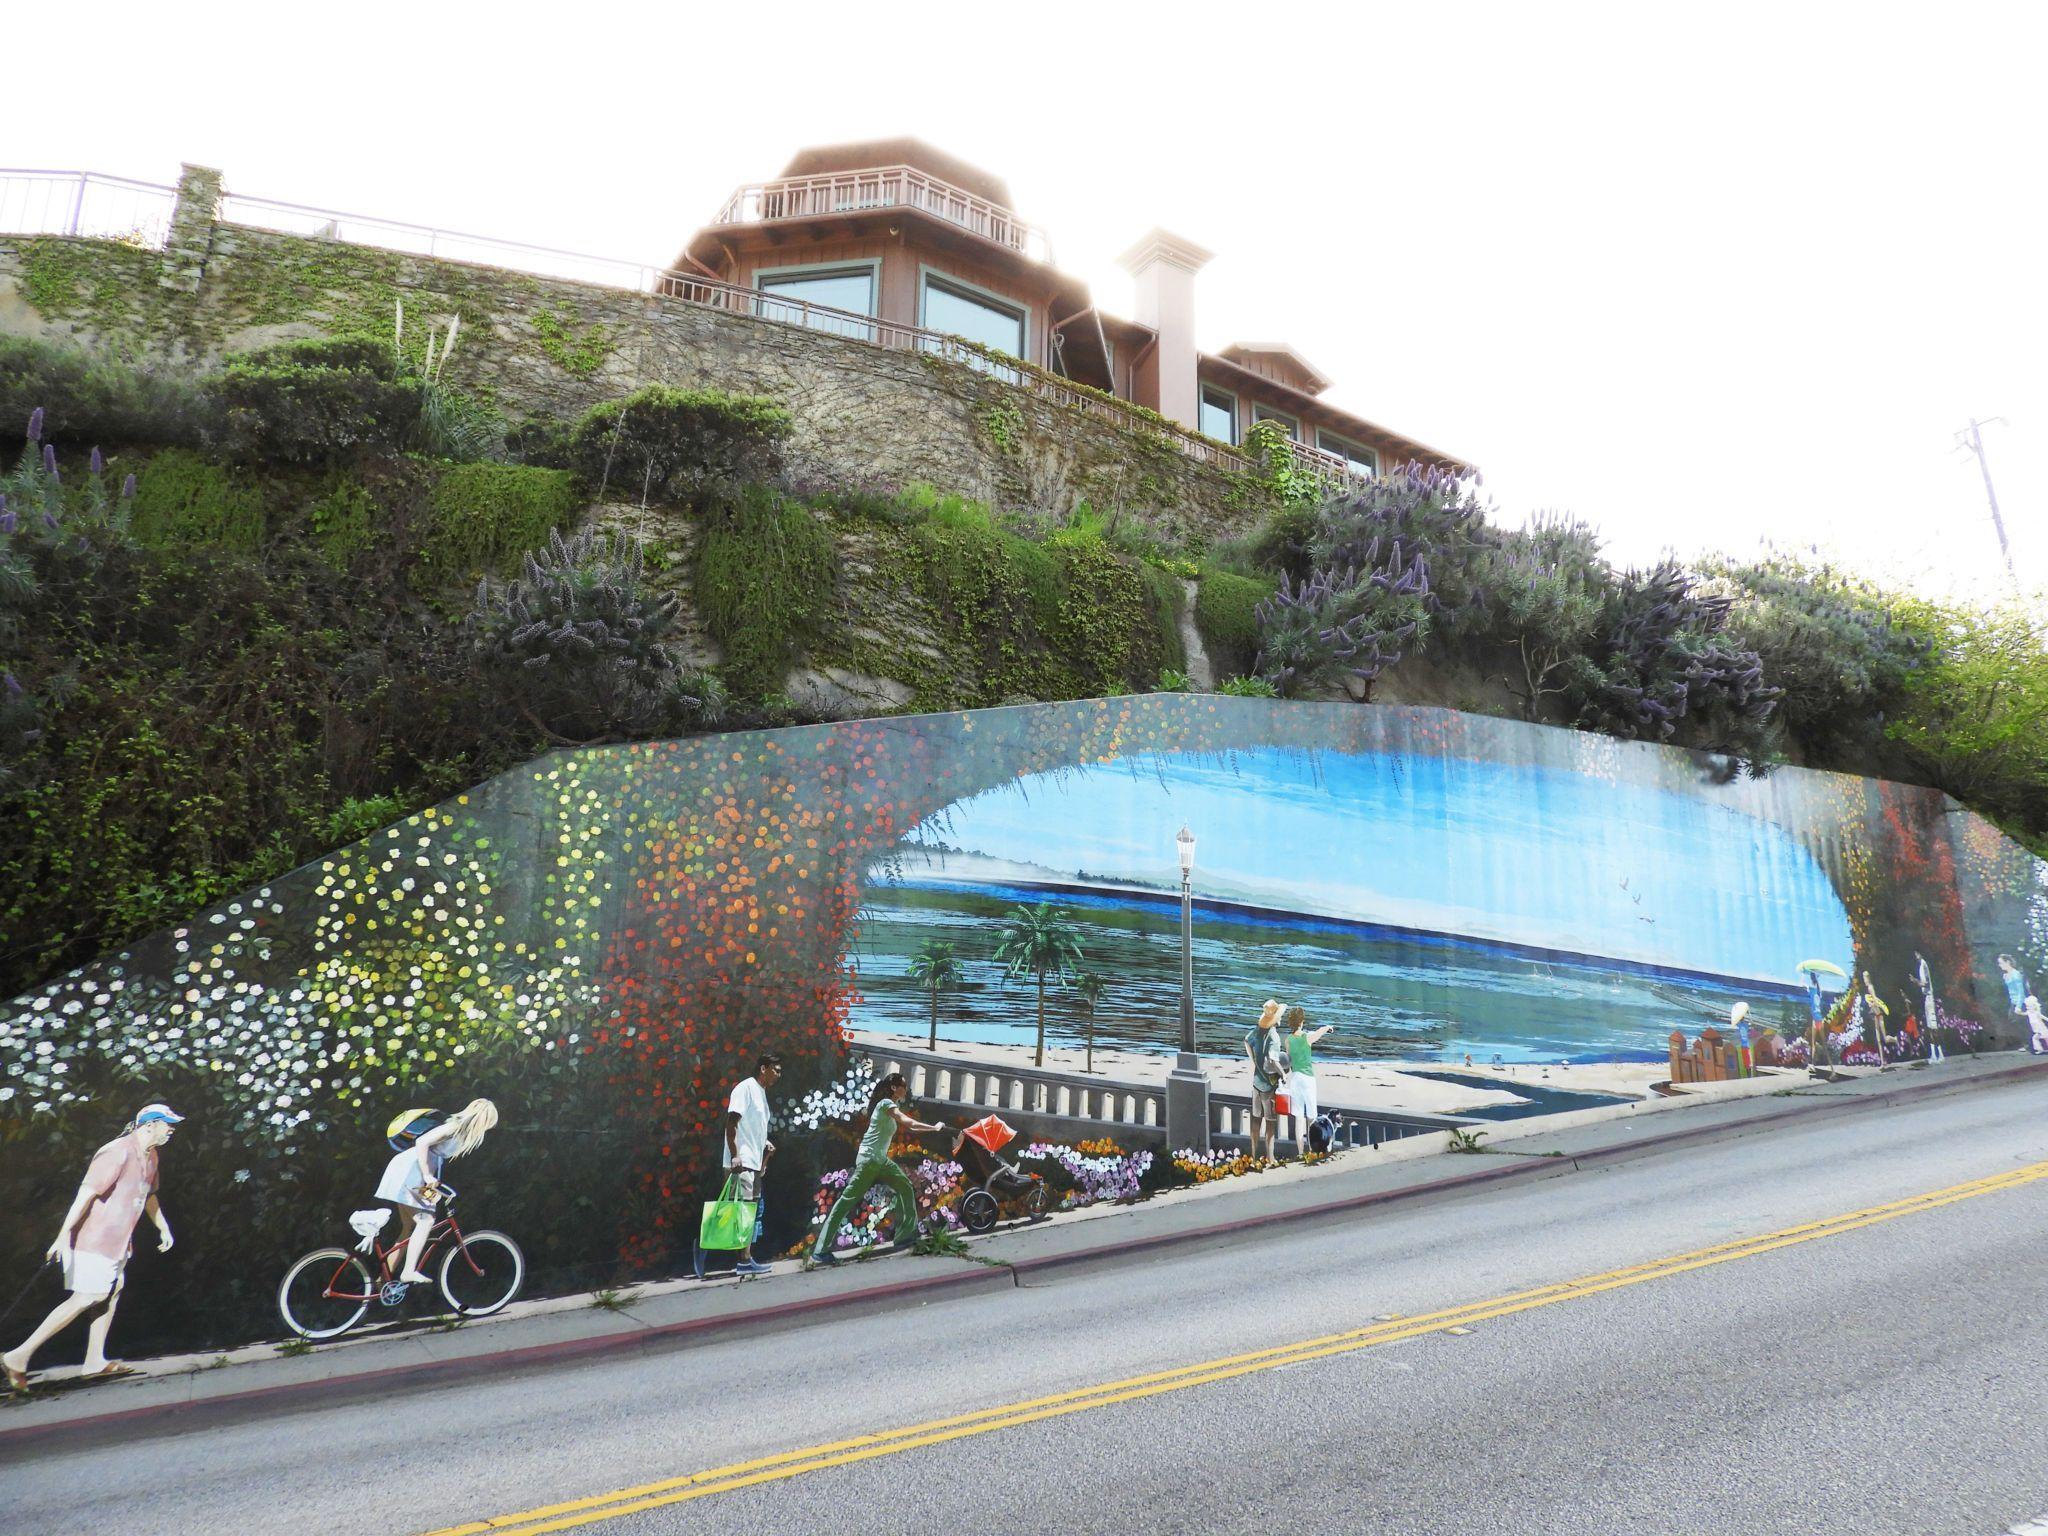 capitola mural